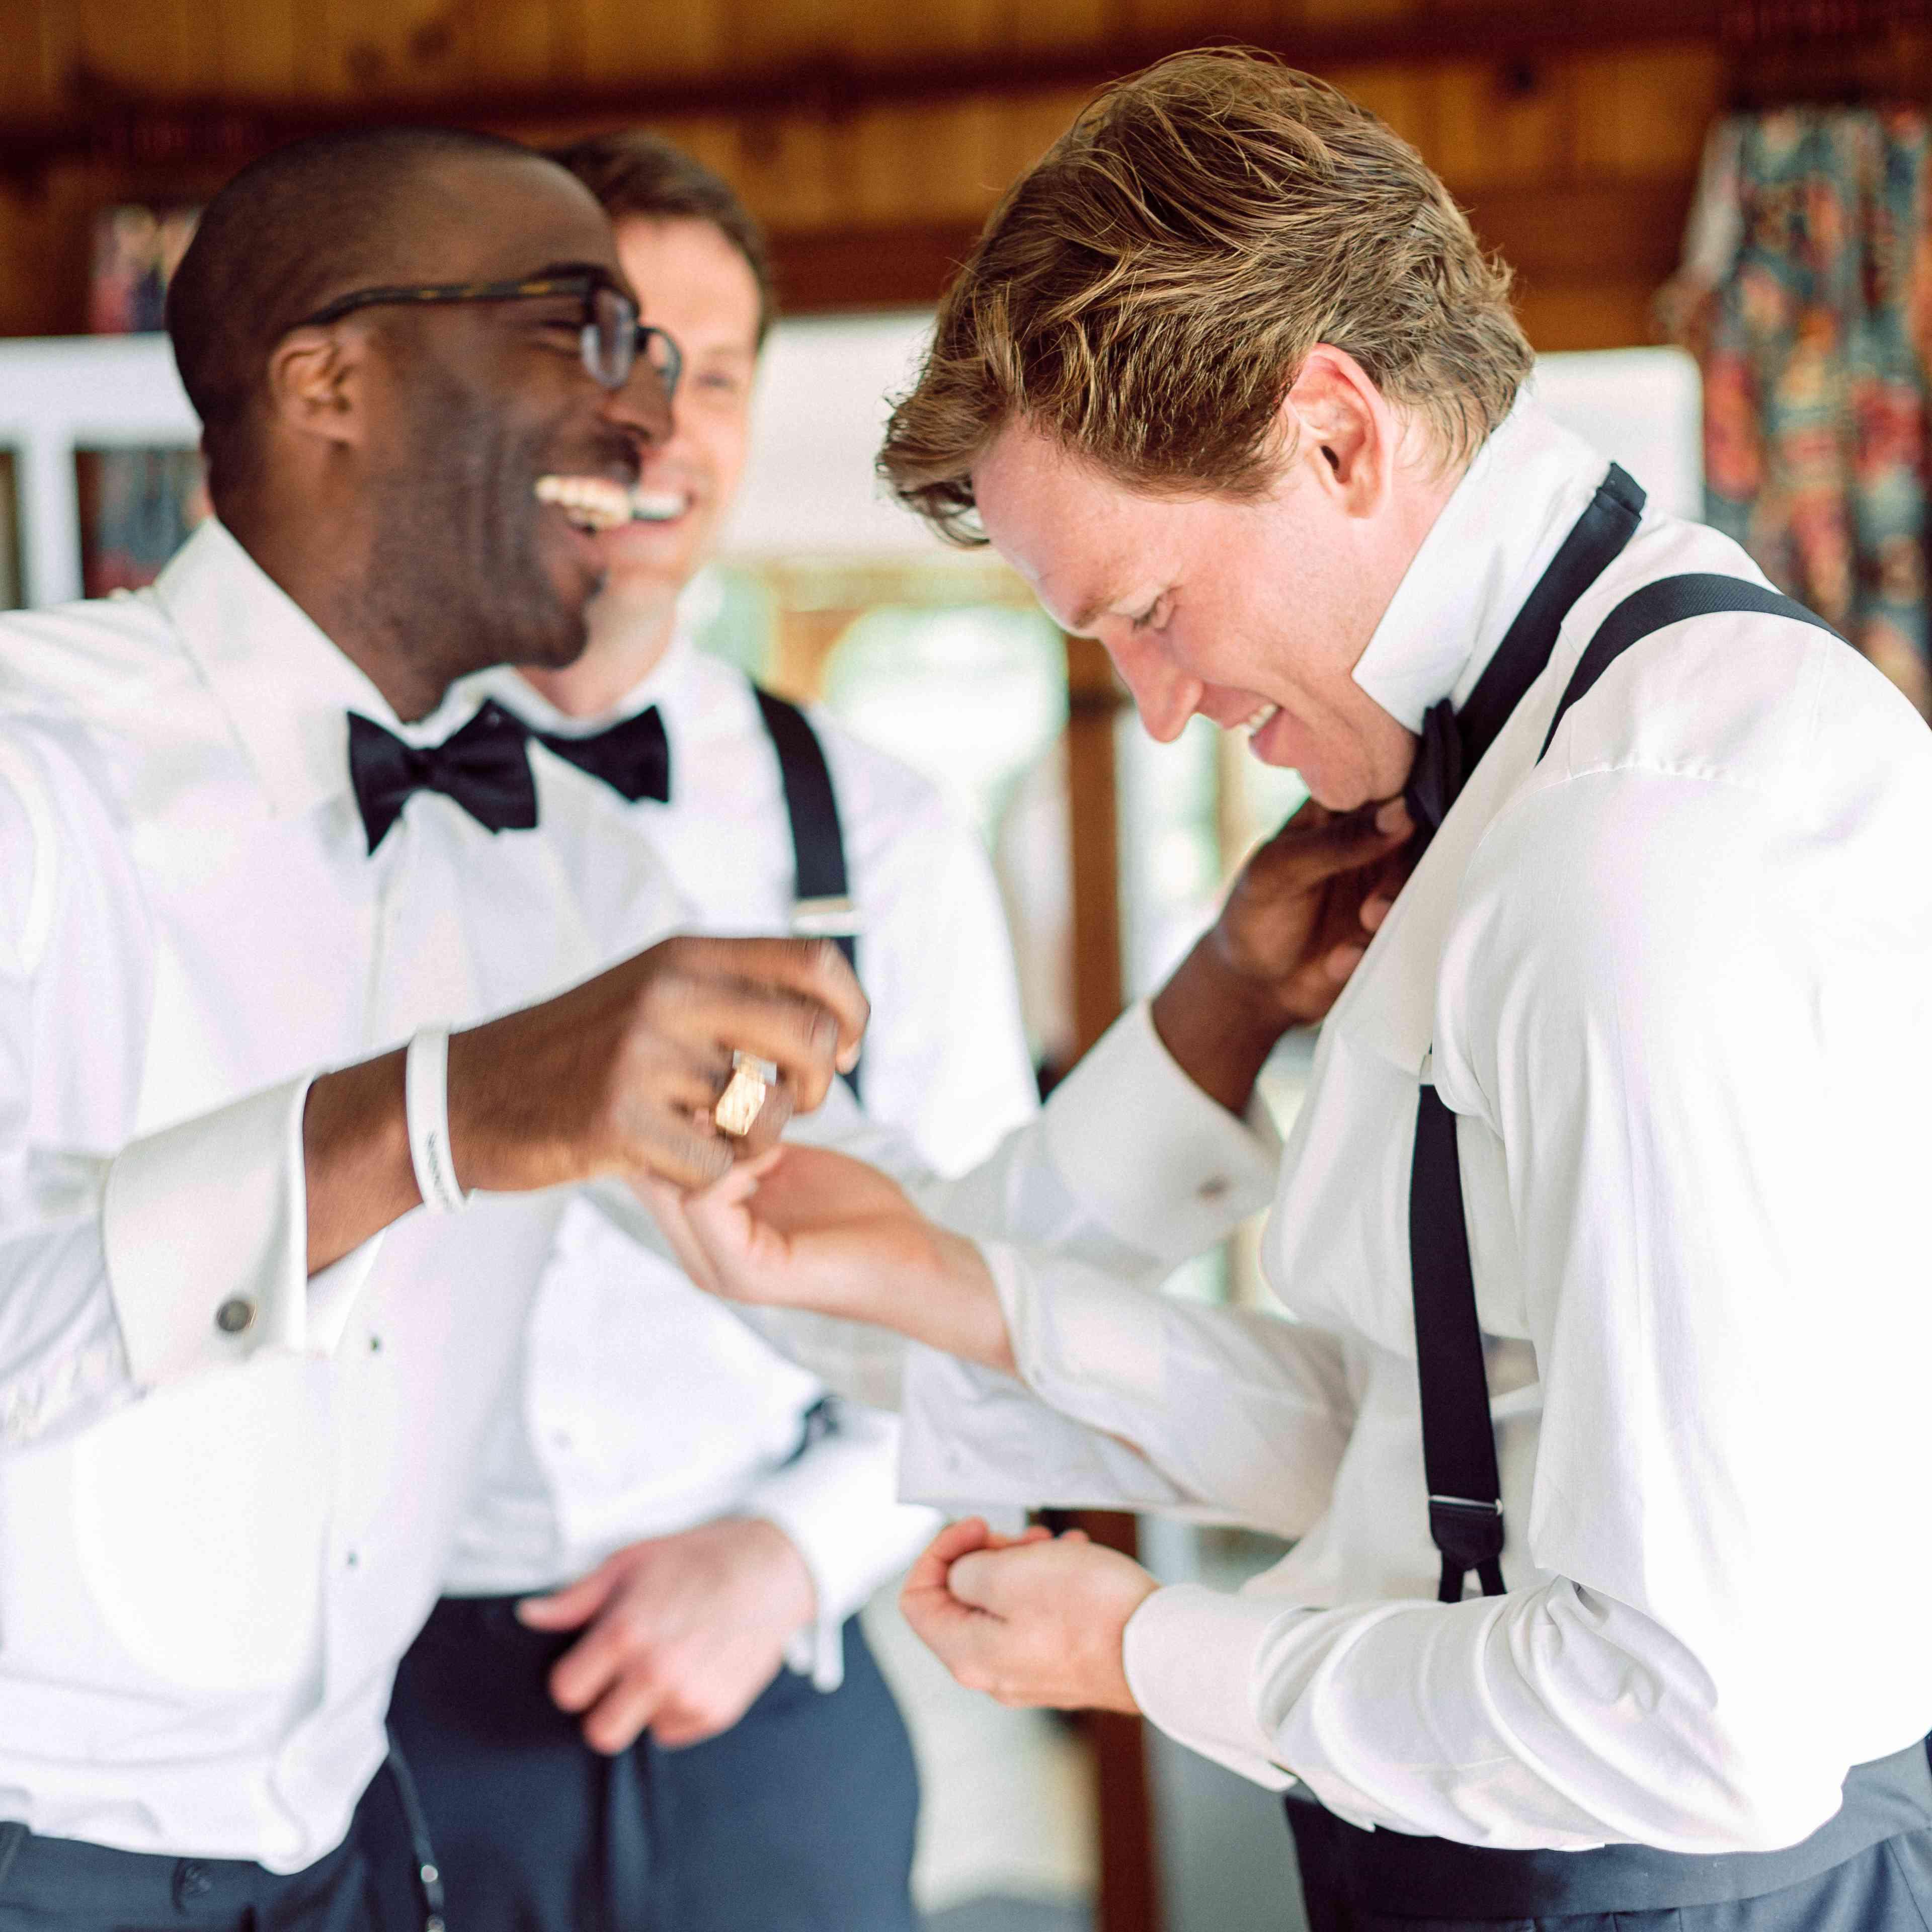 groom and groomsman laughing happy